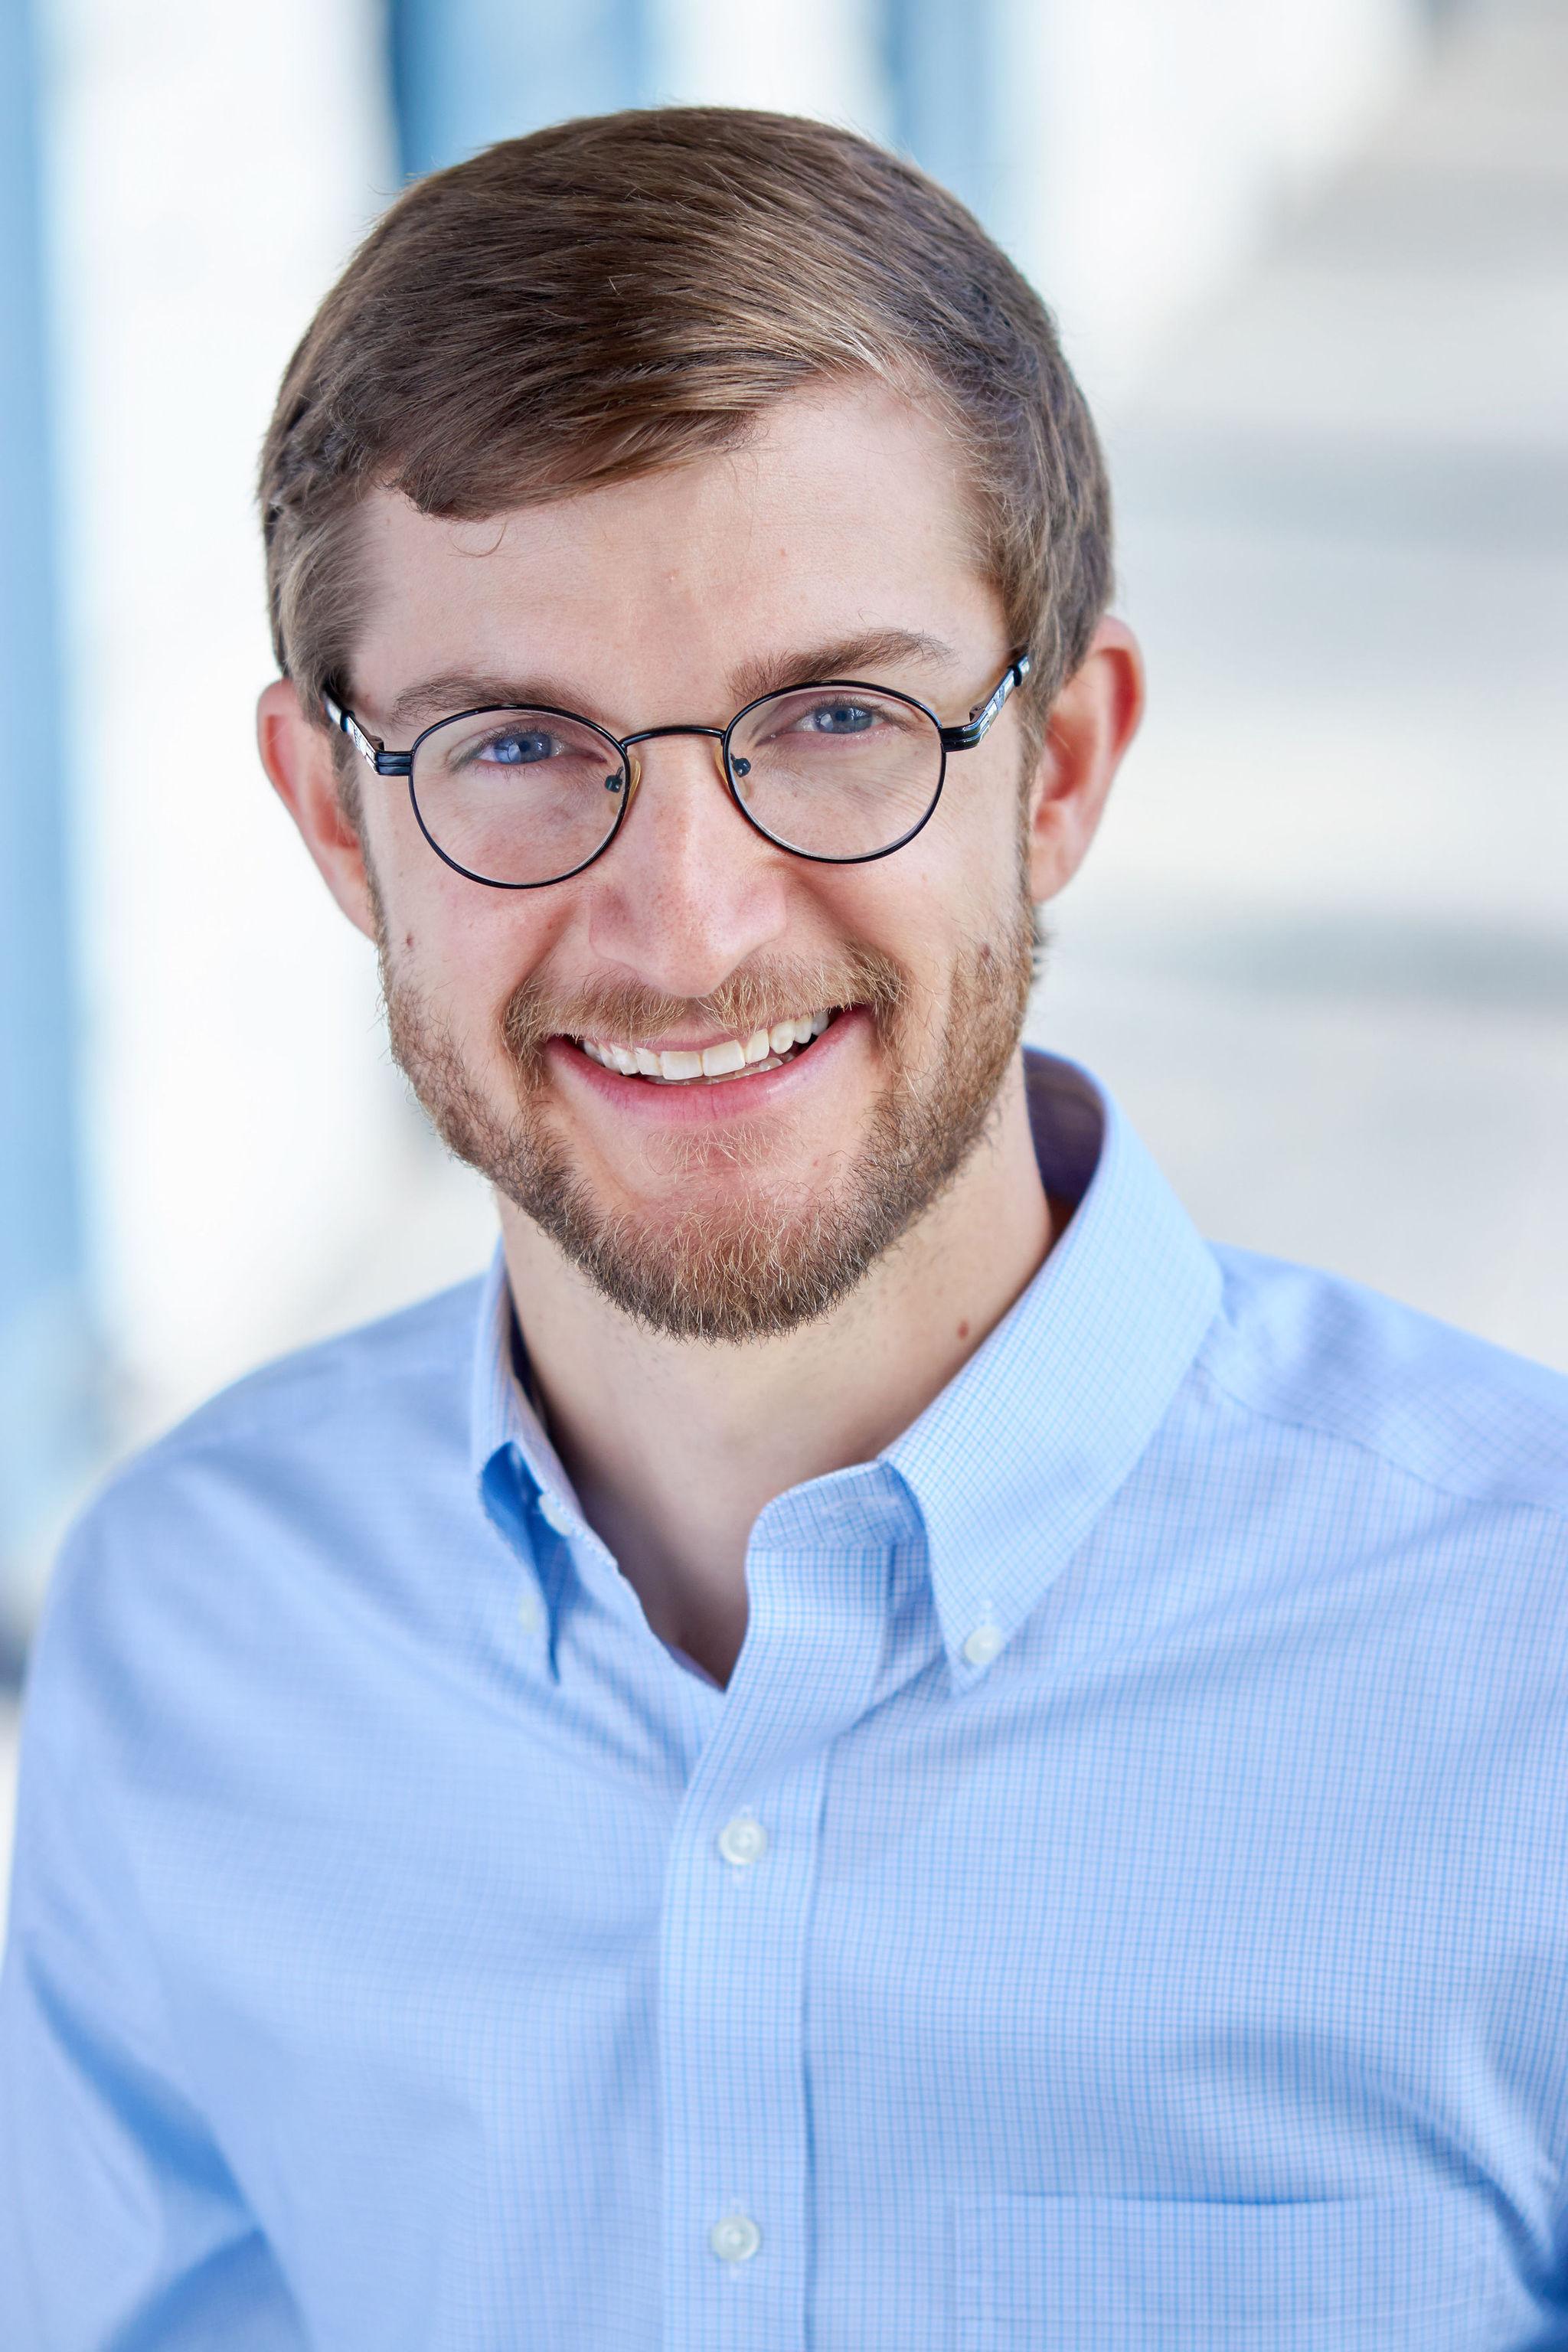 Daniel Whitt